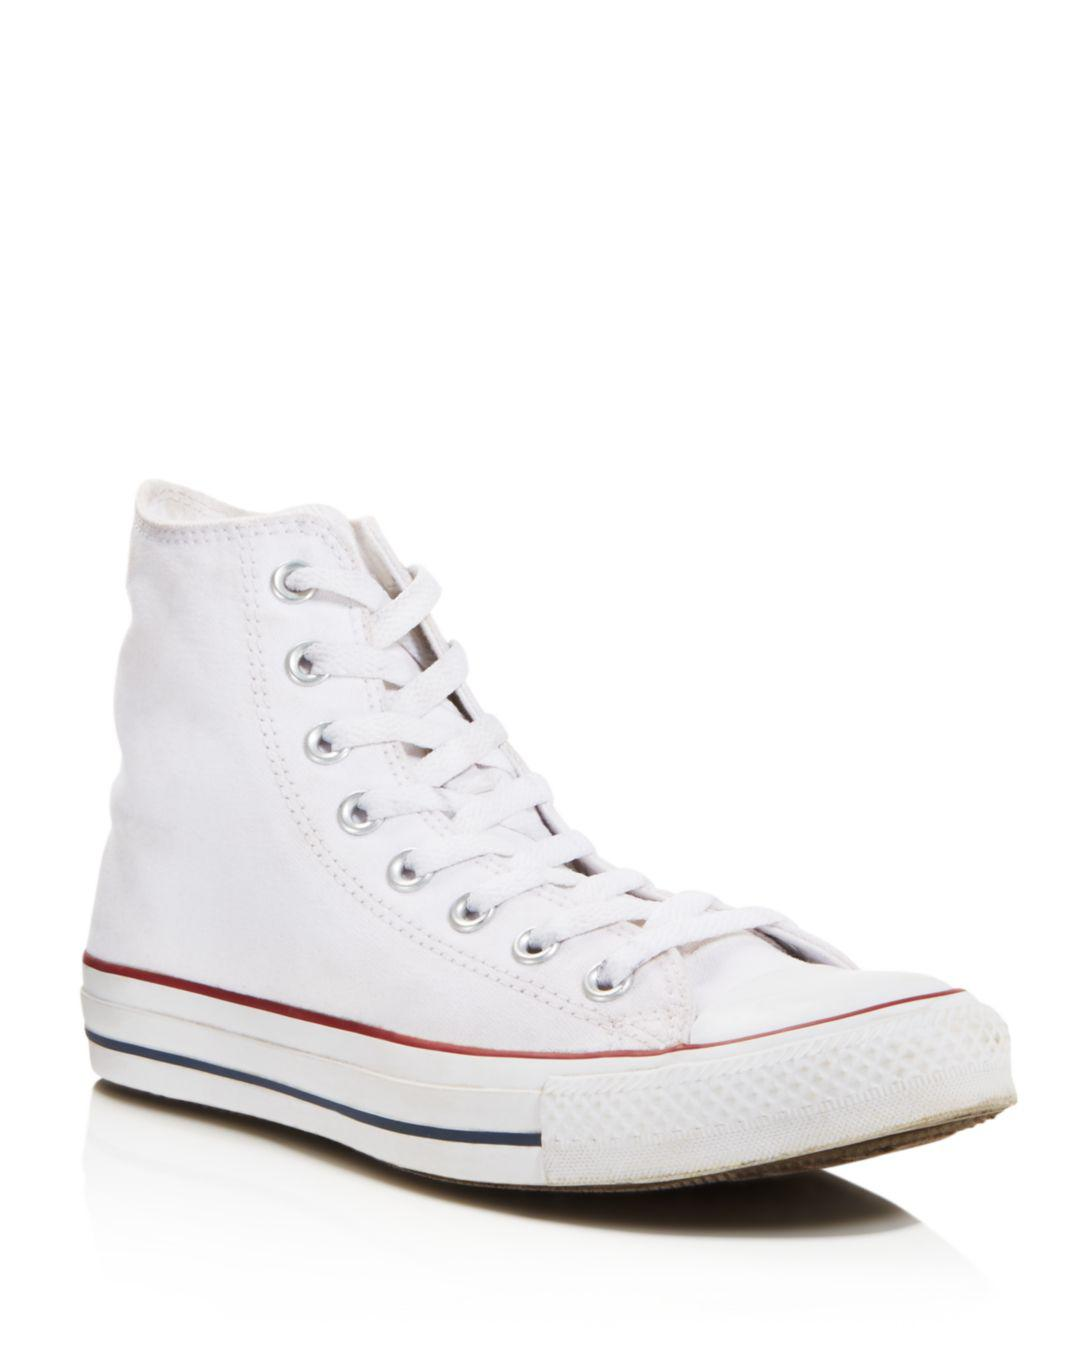 010246b510623a Lyst - Converse All Star Hi Top Women s Trainer White in White ...